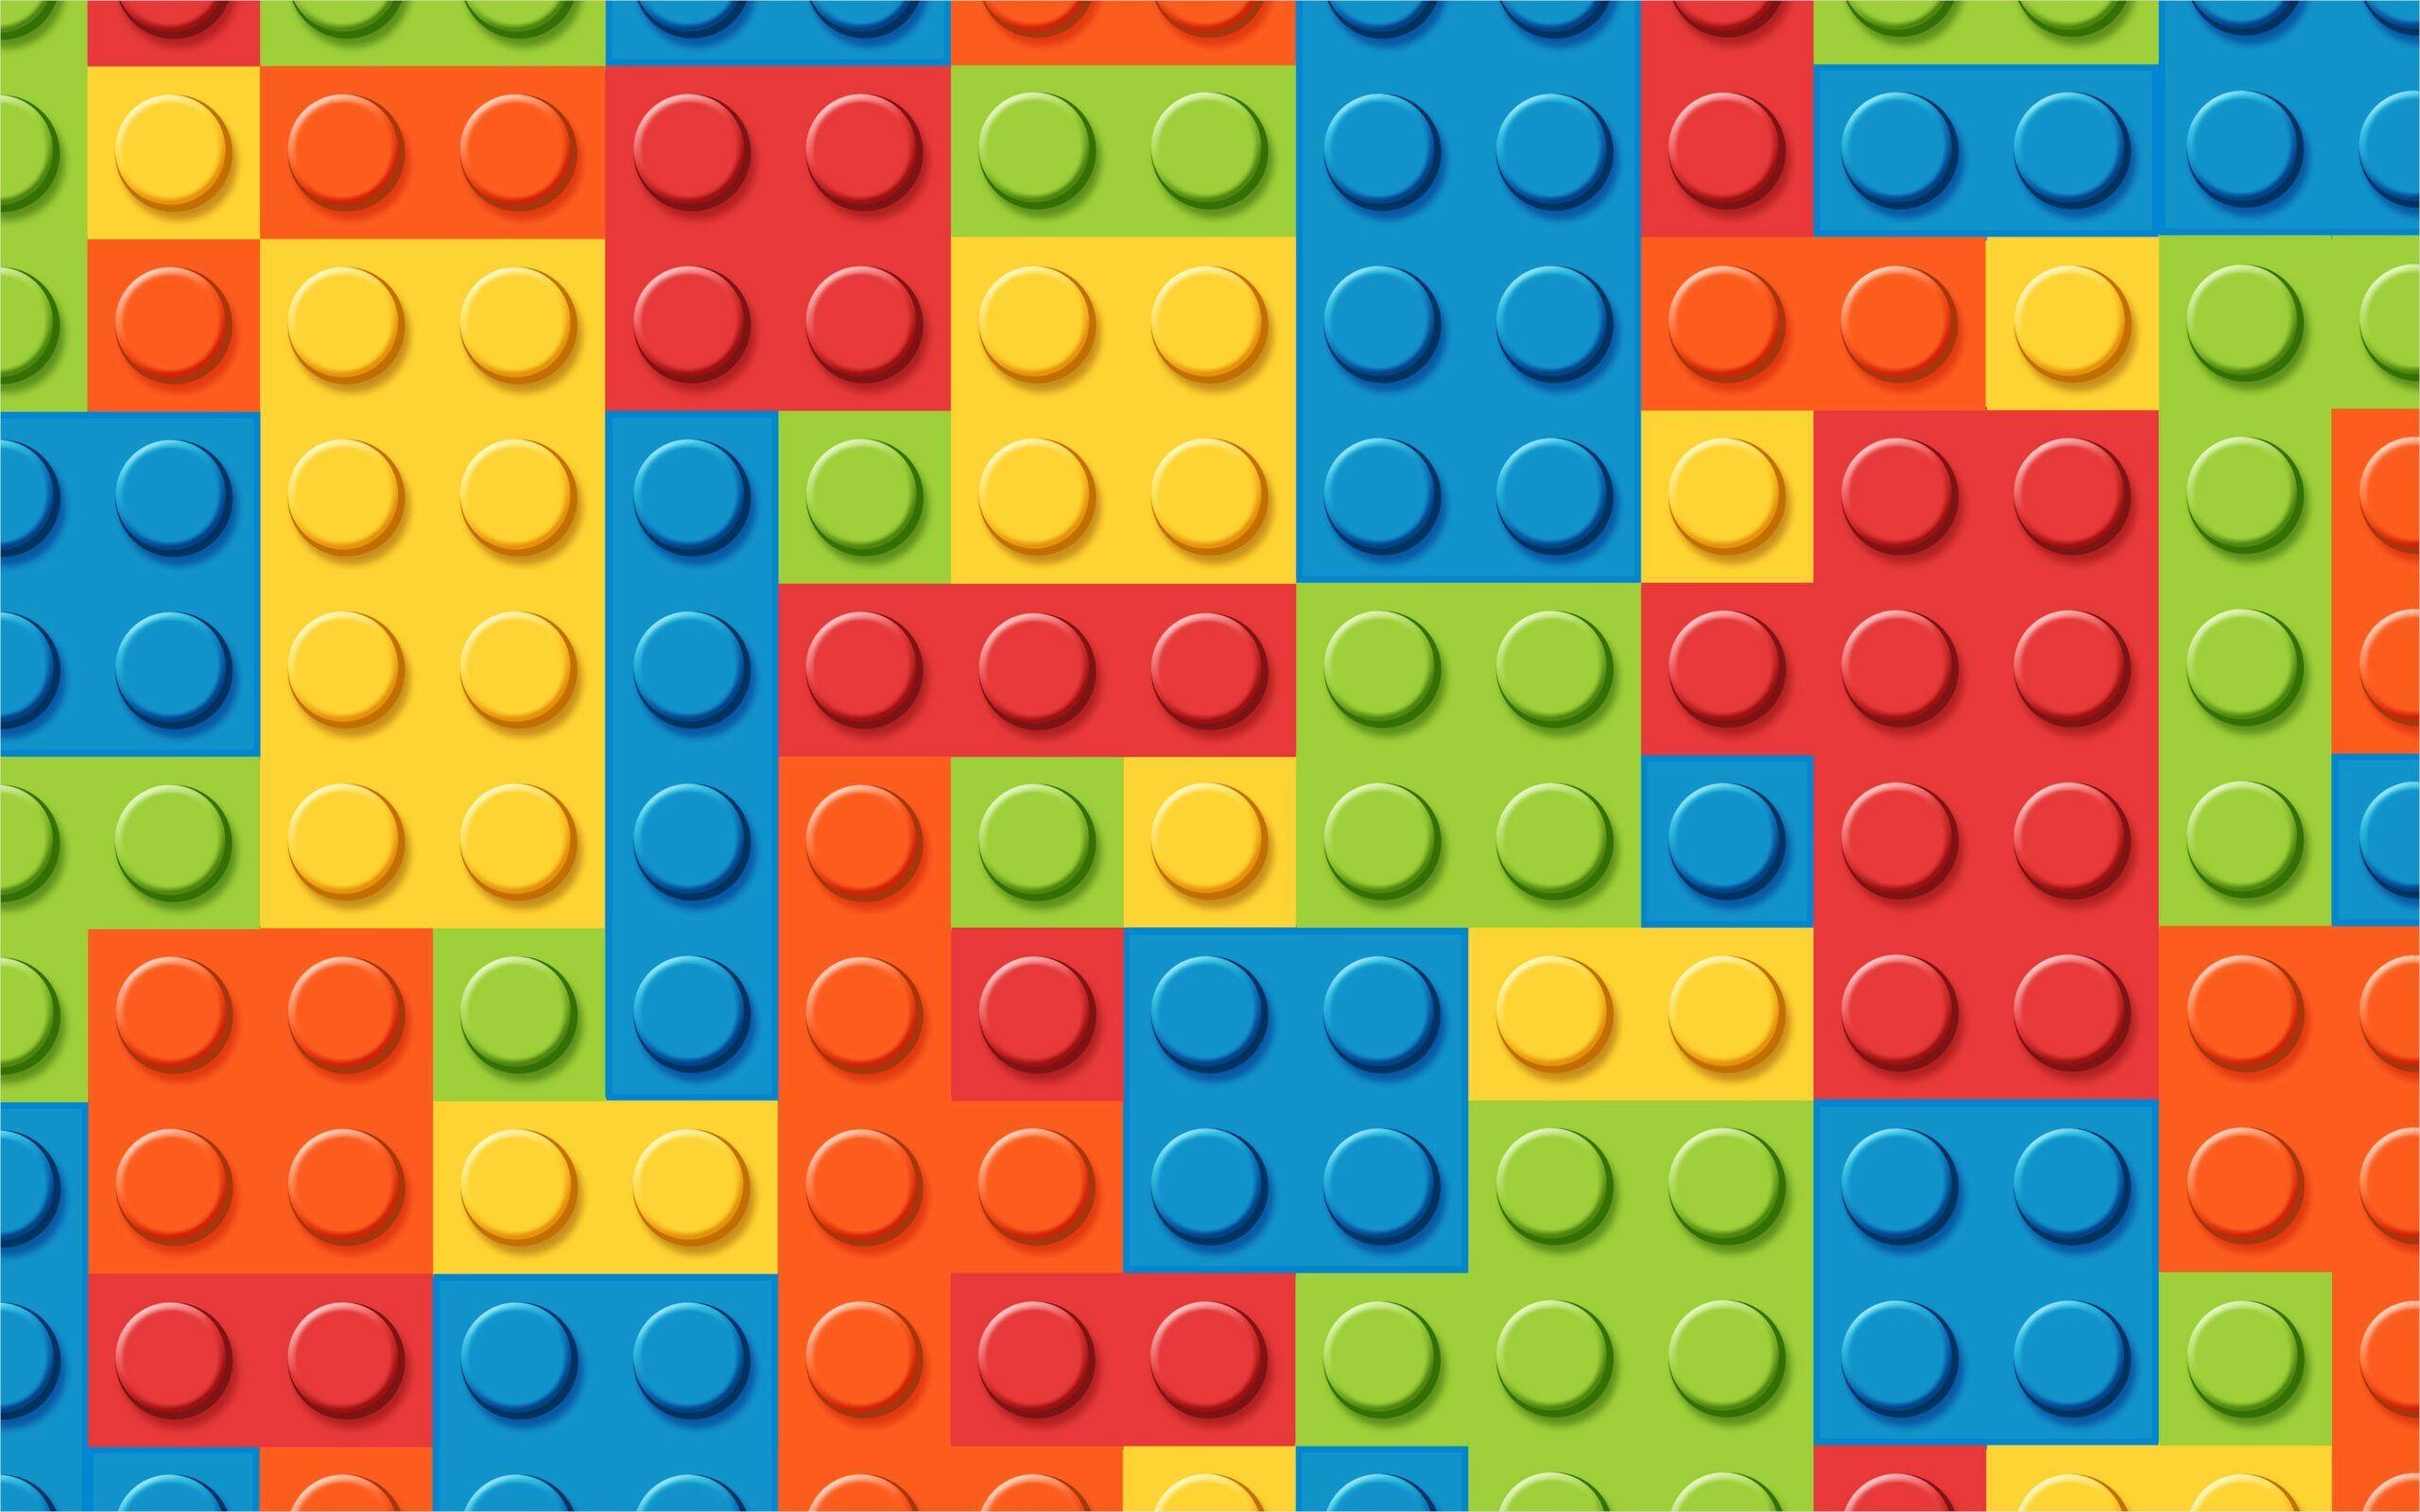 4k Lego Blocks Wallpaper In 2020 Lego Blocks Wallpaper Lego